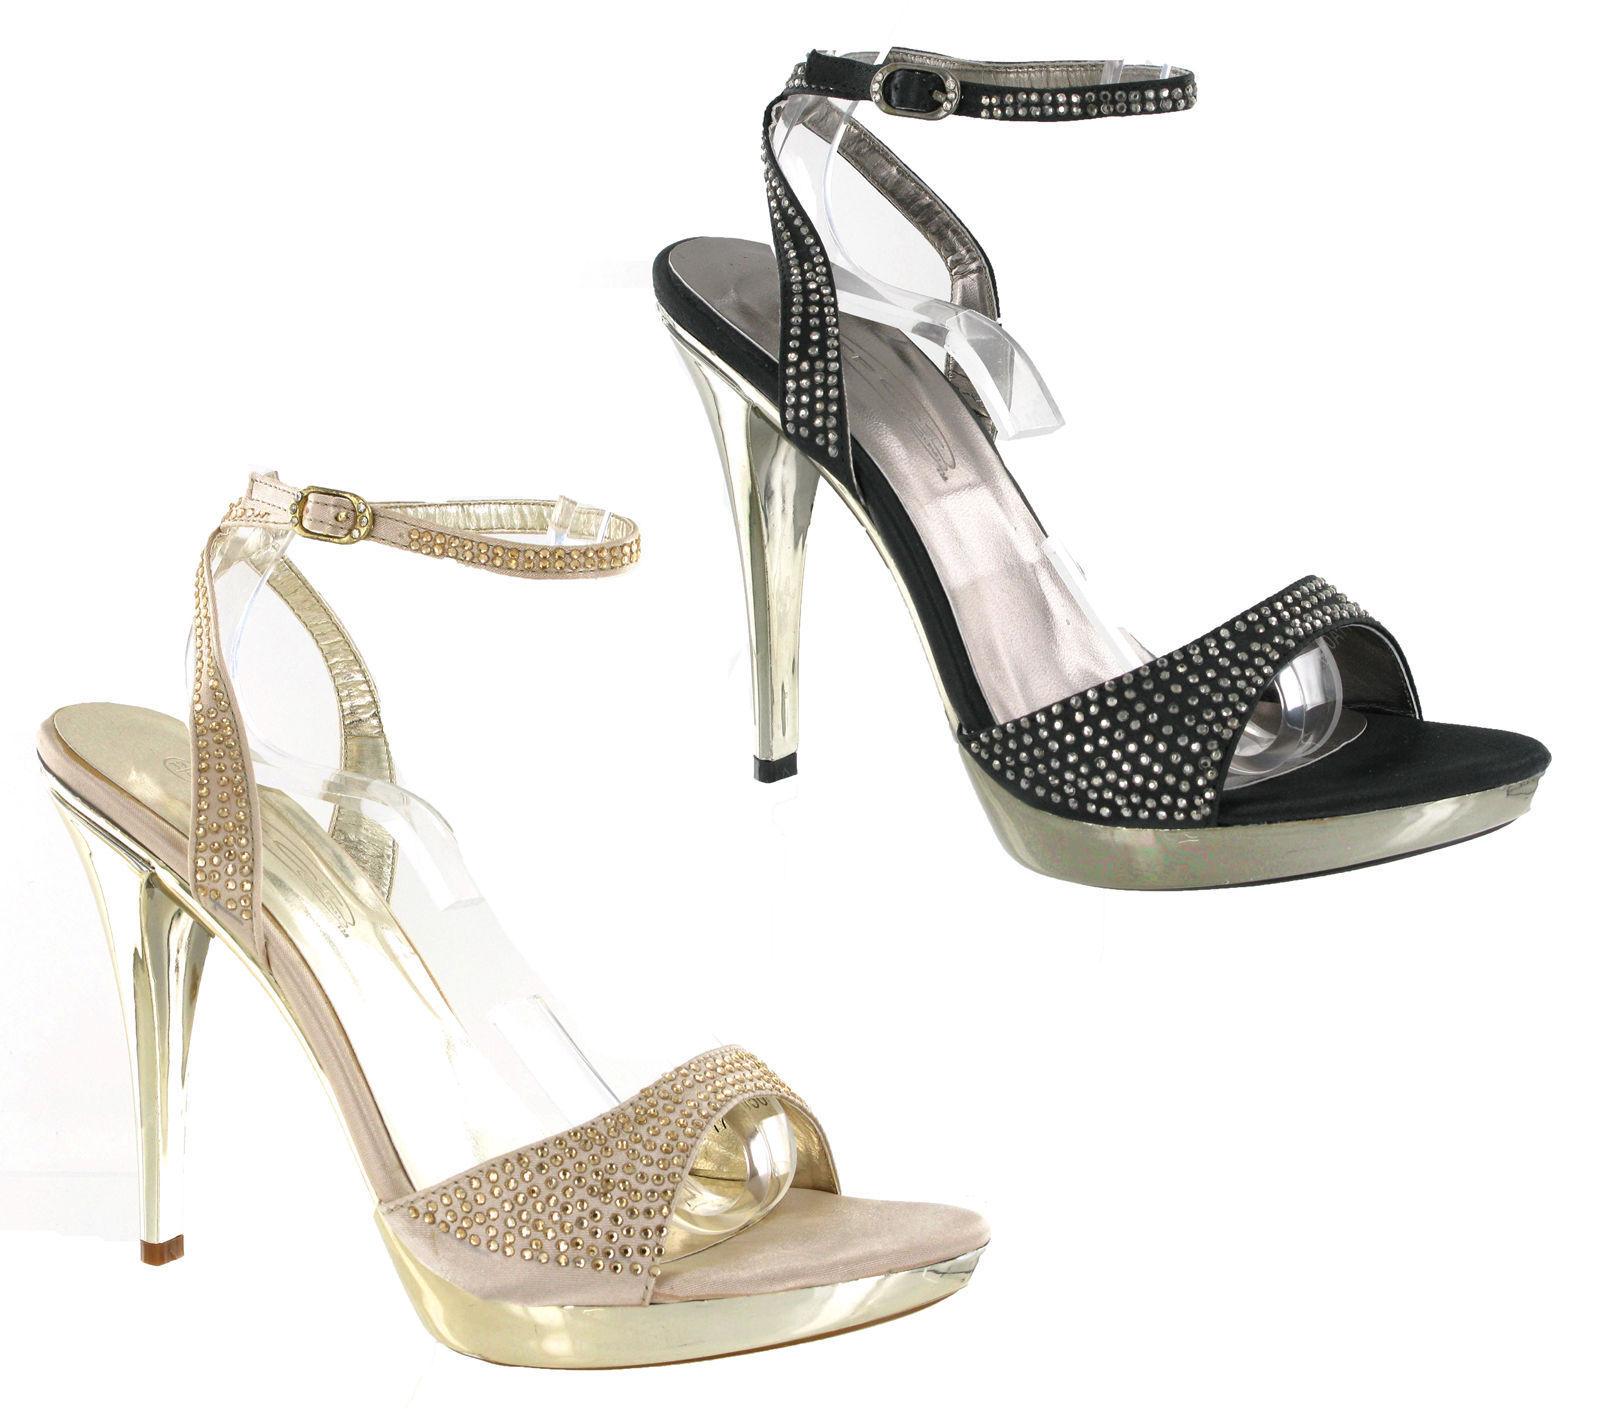 Womens High Stiletto Heels Ladies Platform Party Diamante Strappy Shoes UK 3-8